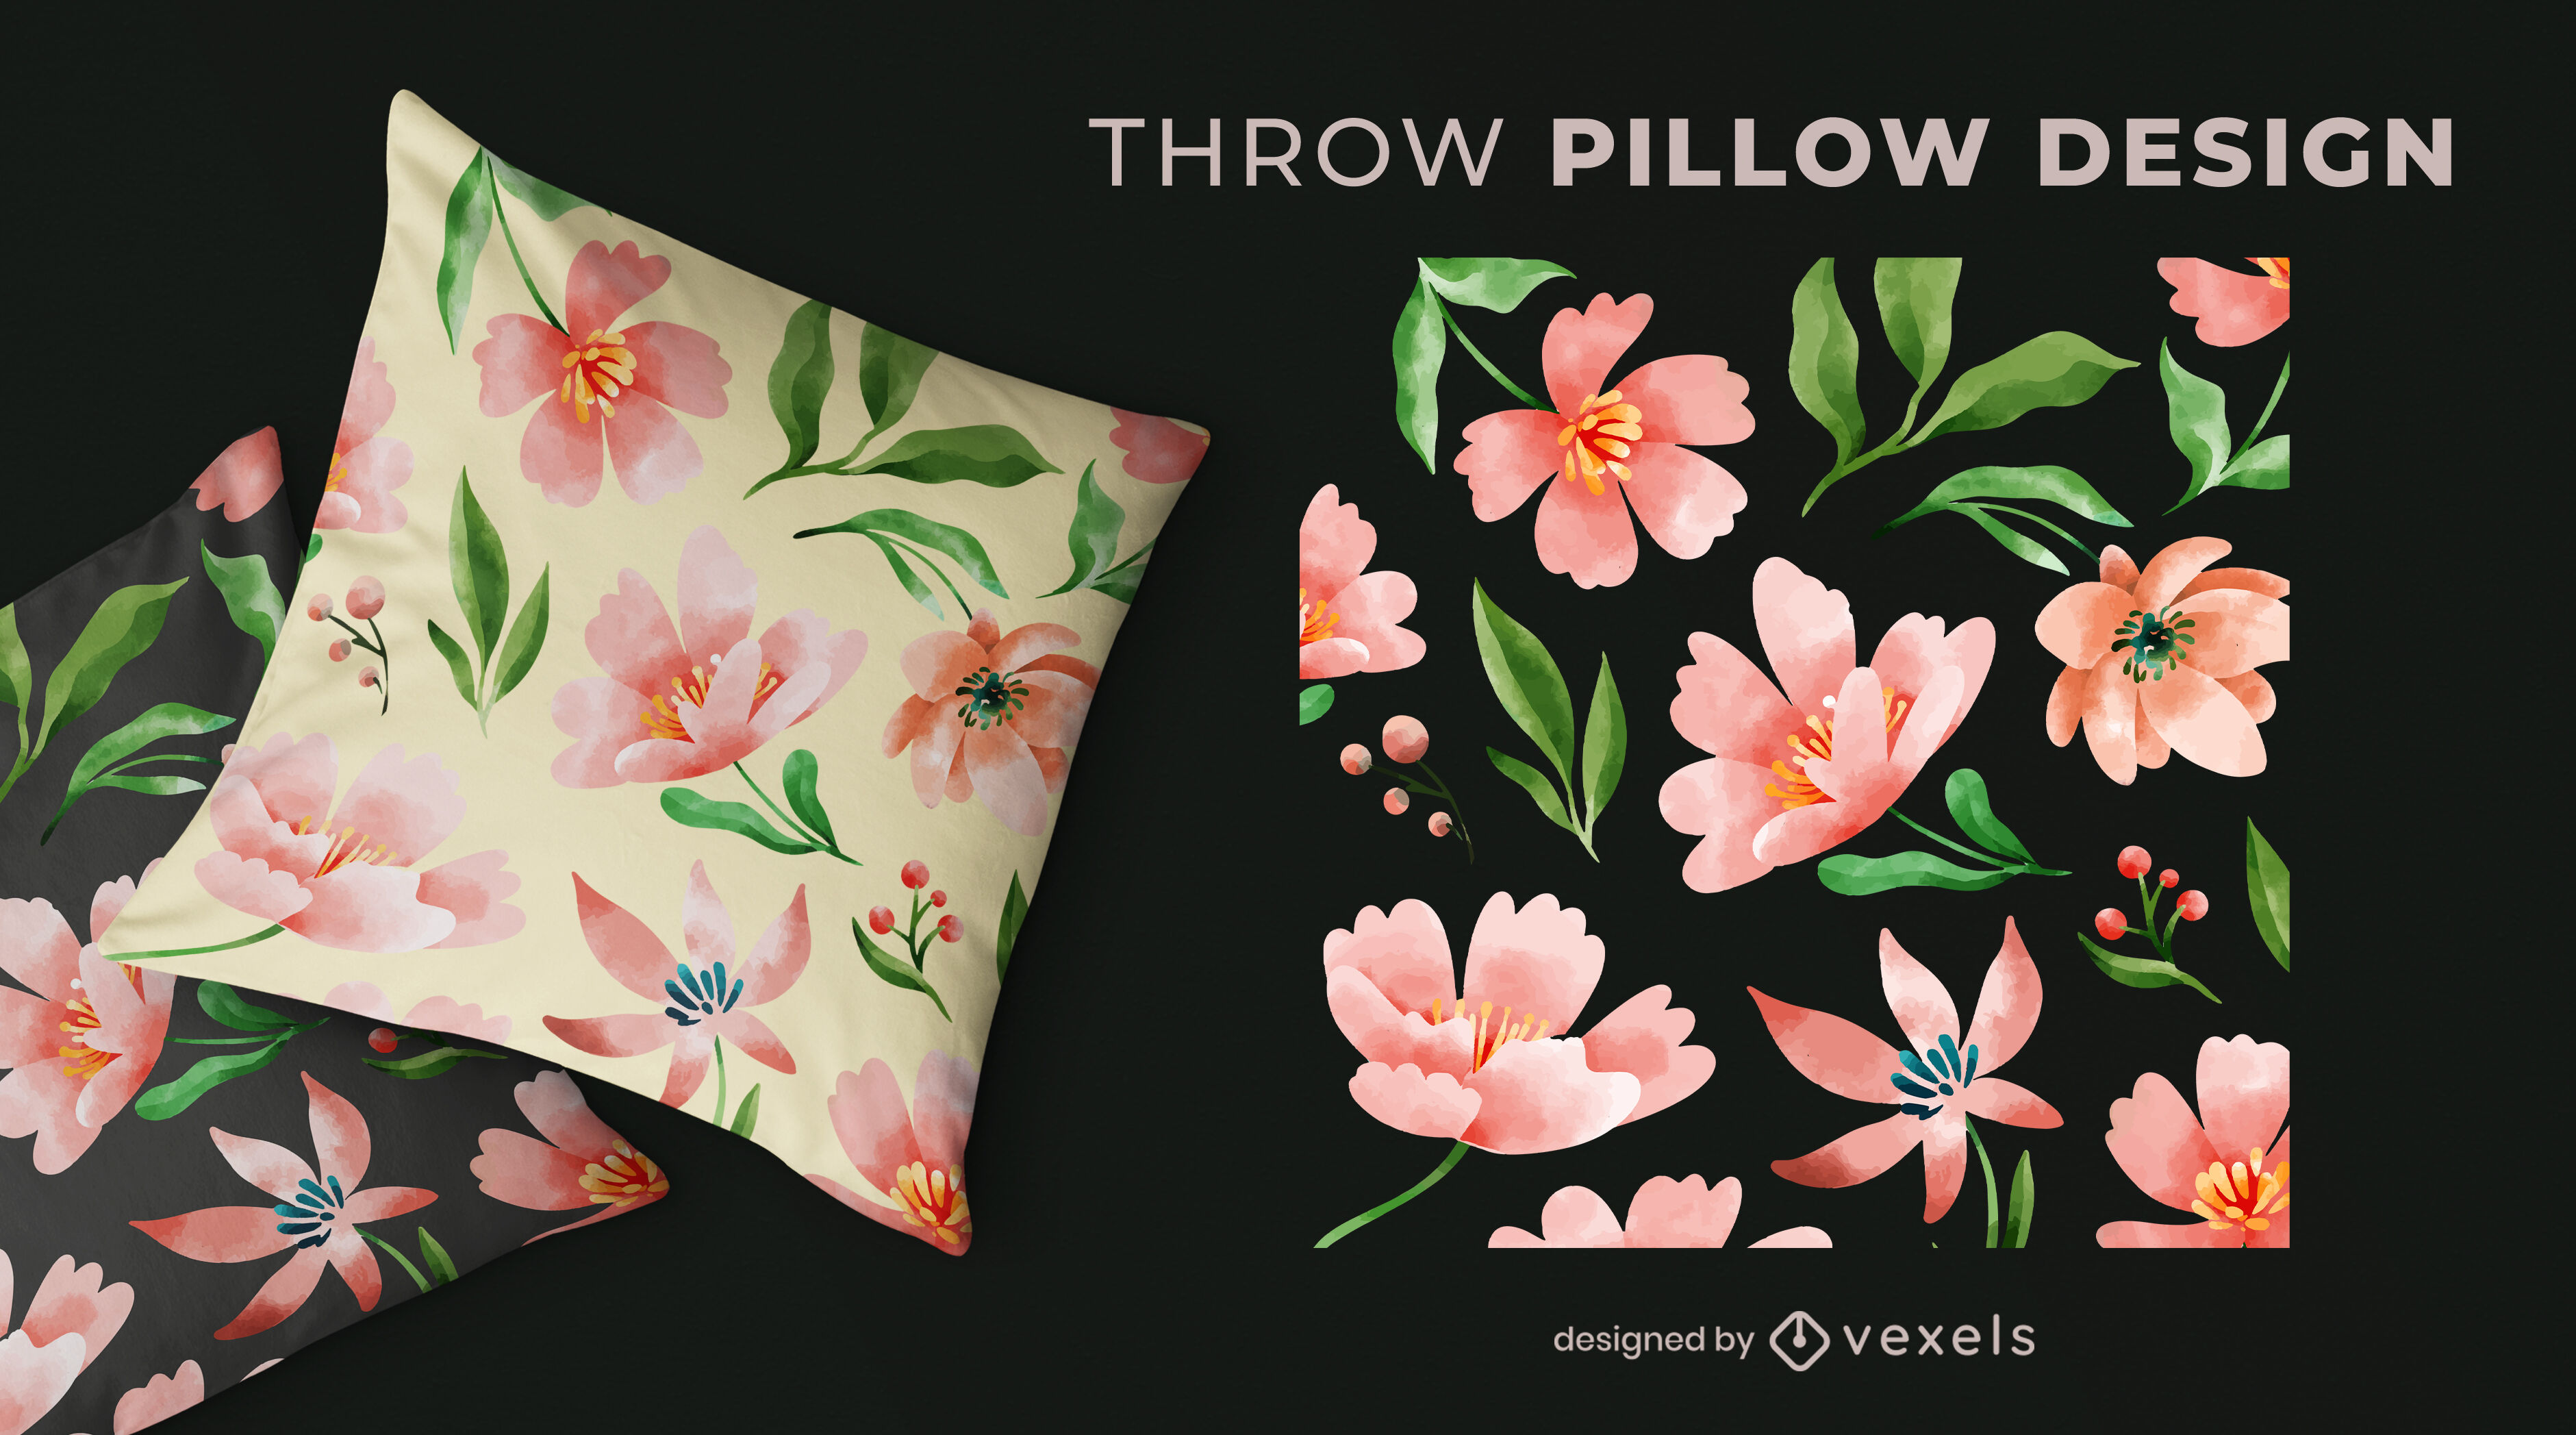 Dise?o de almohada de patr?n de flores de color rosa acuarela